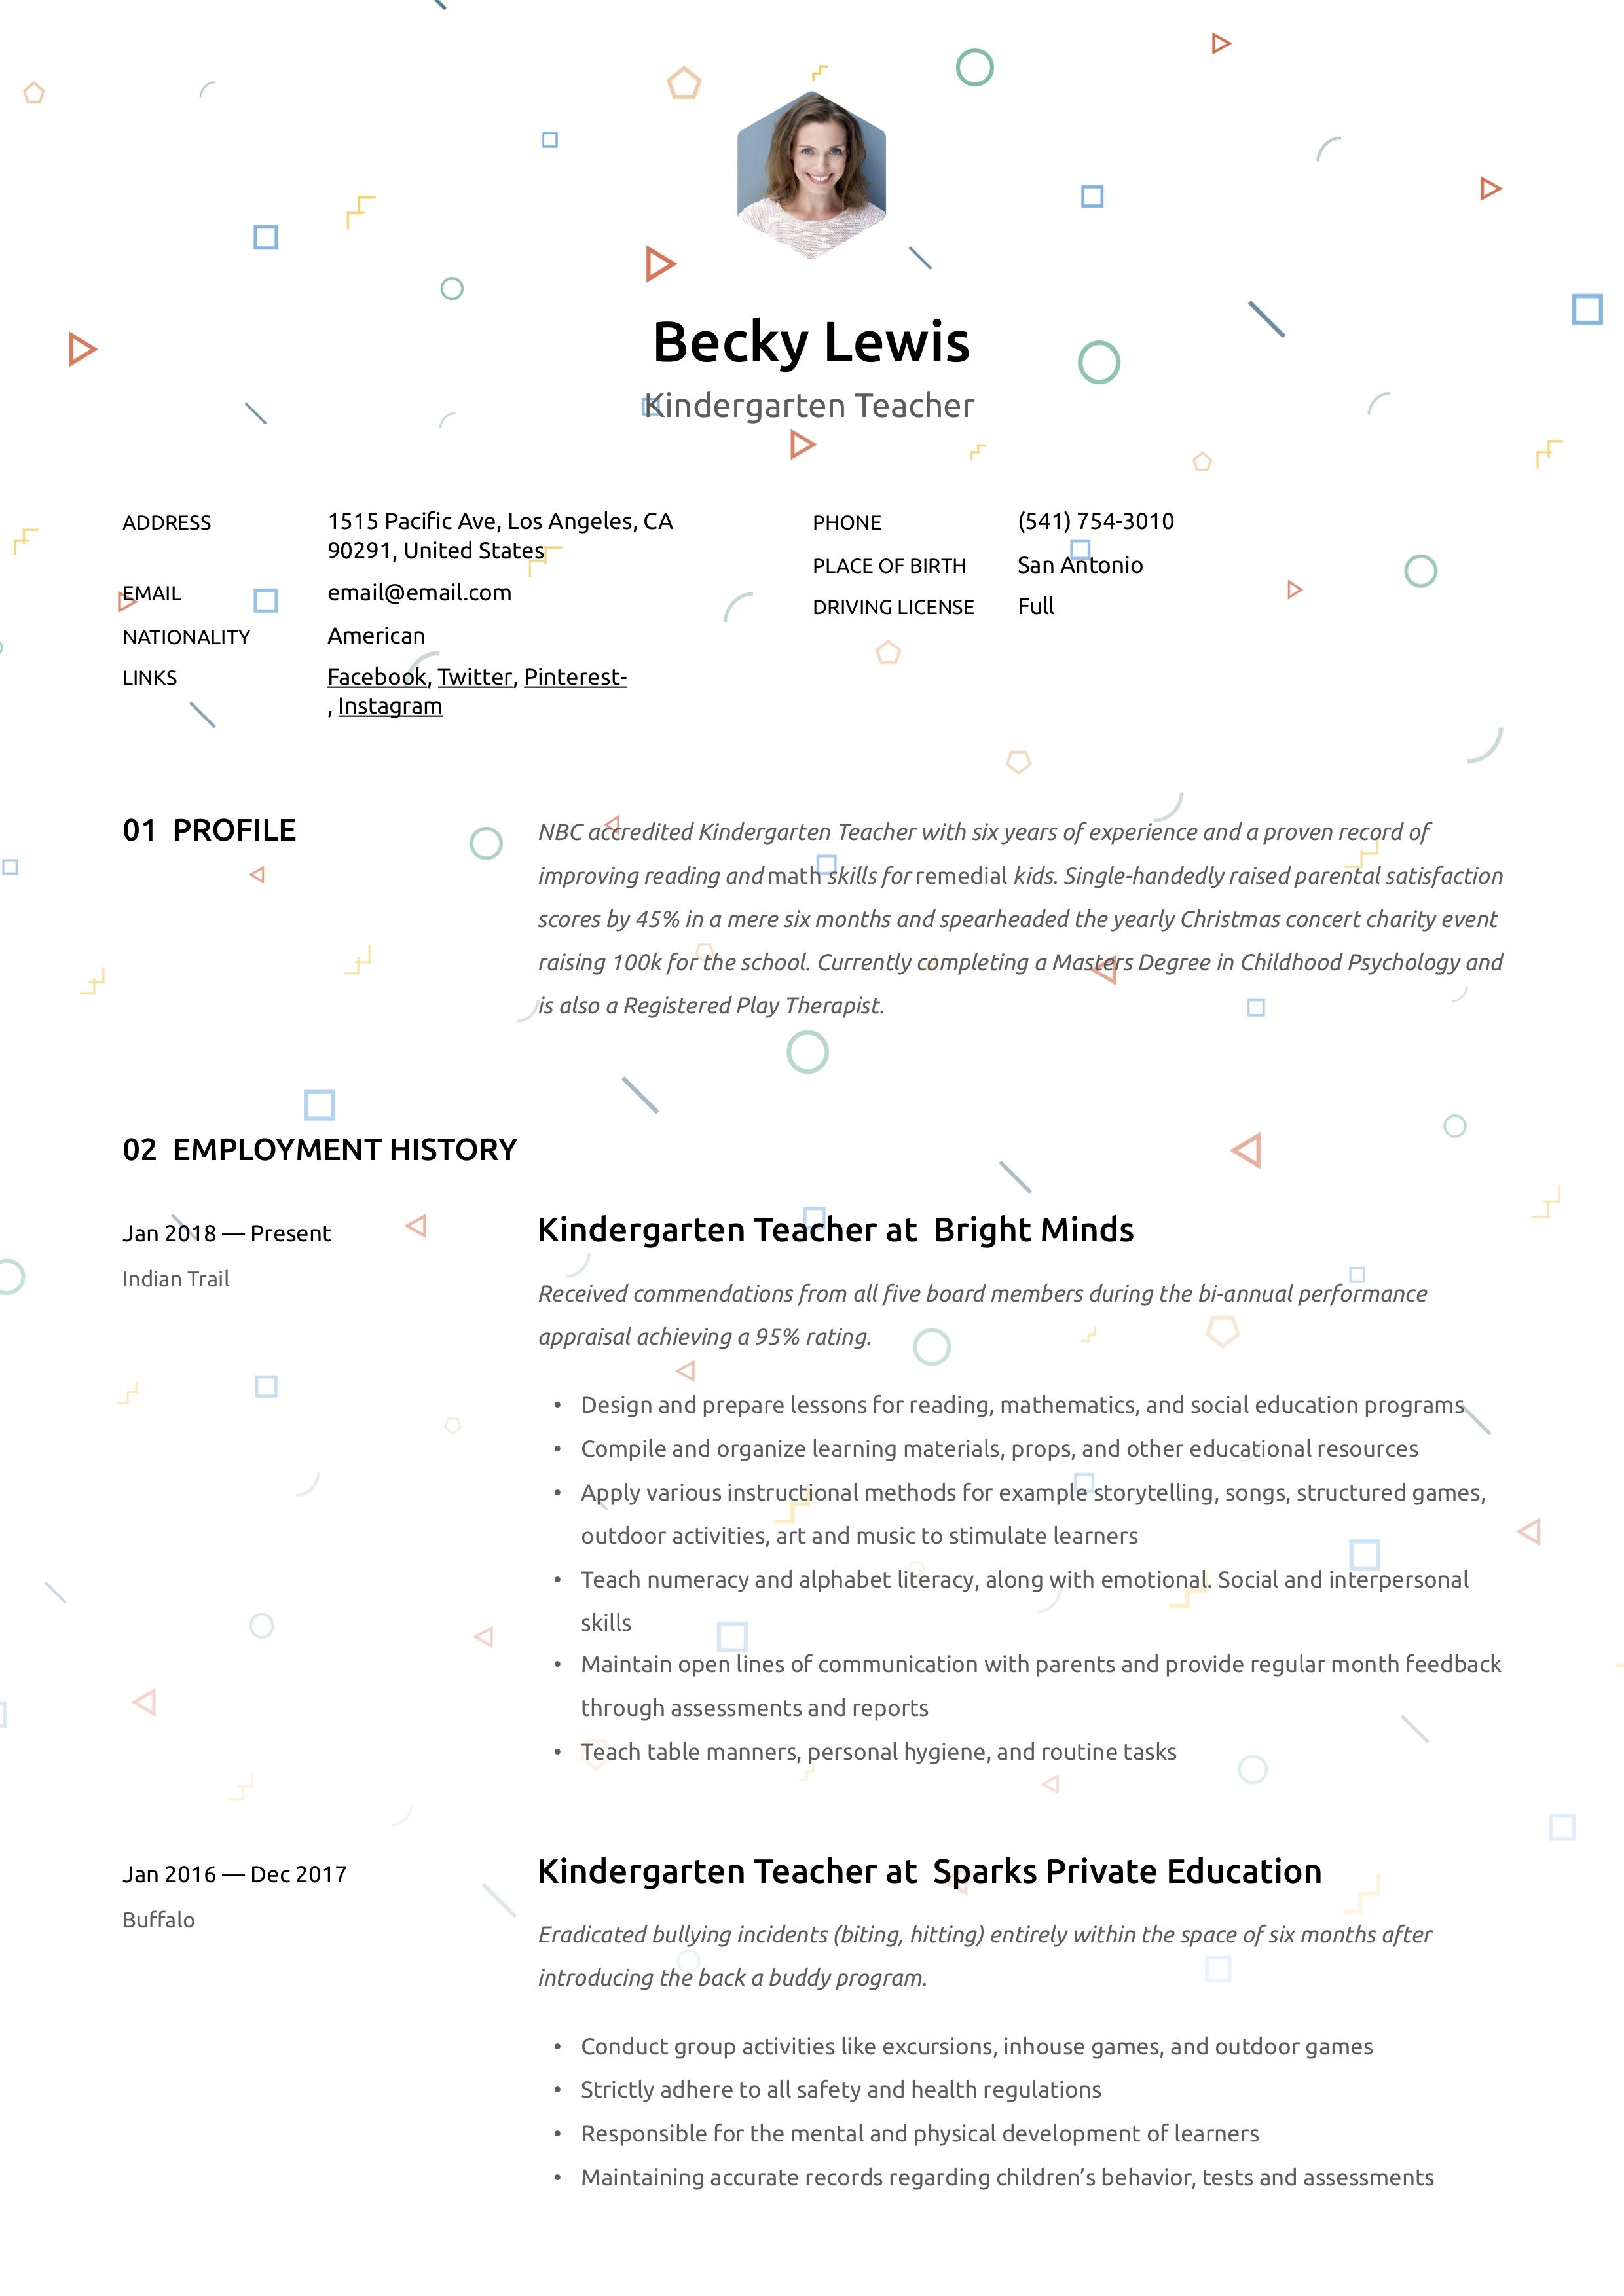 Kindergarten Teacher Resume & Writing Guide in 2020